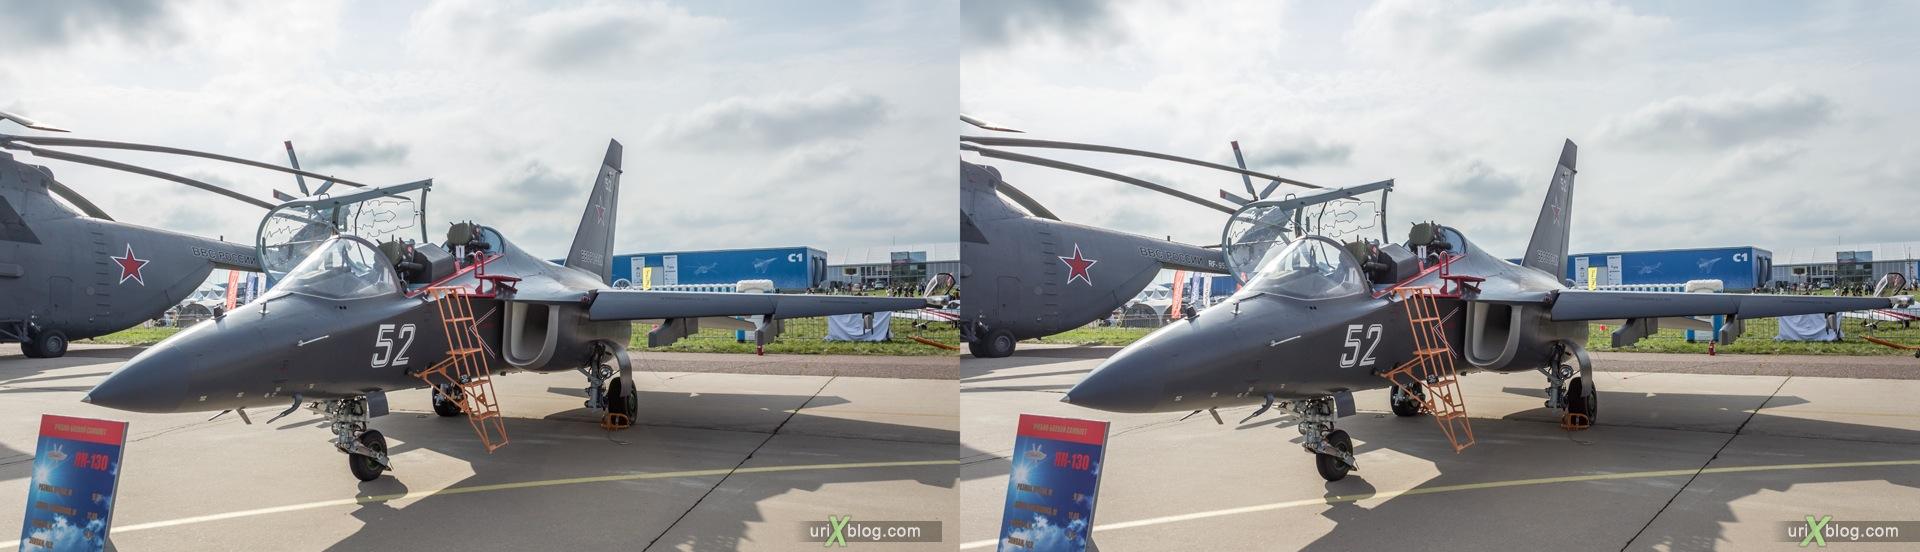 2013, Yak-130, MAKS, International Aviation and Space Salon, Russia, Soviet, USSR, Ramenskoye airfield, airplane, 3D, stereo pair, cross-eyed, crossview, cross view stereo pair, stereoscopic